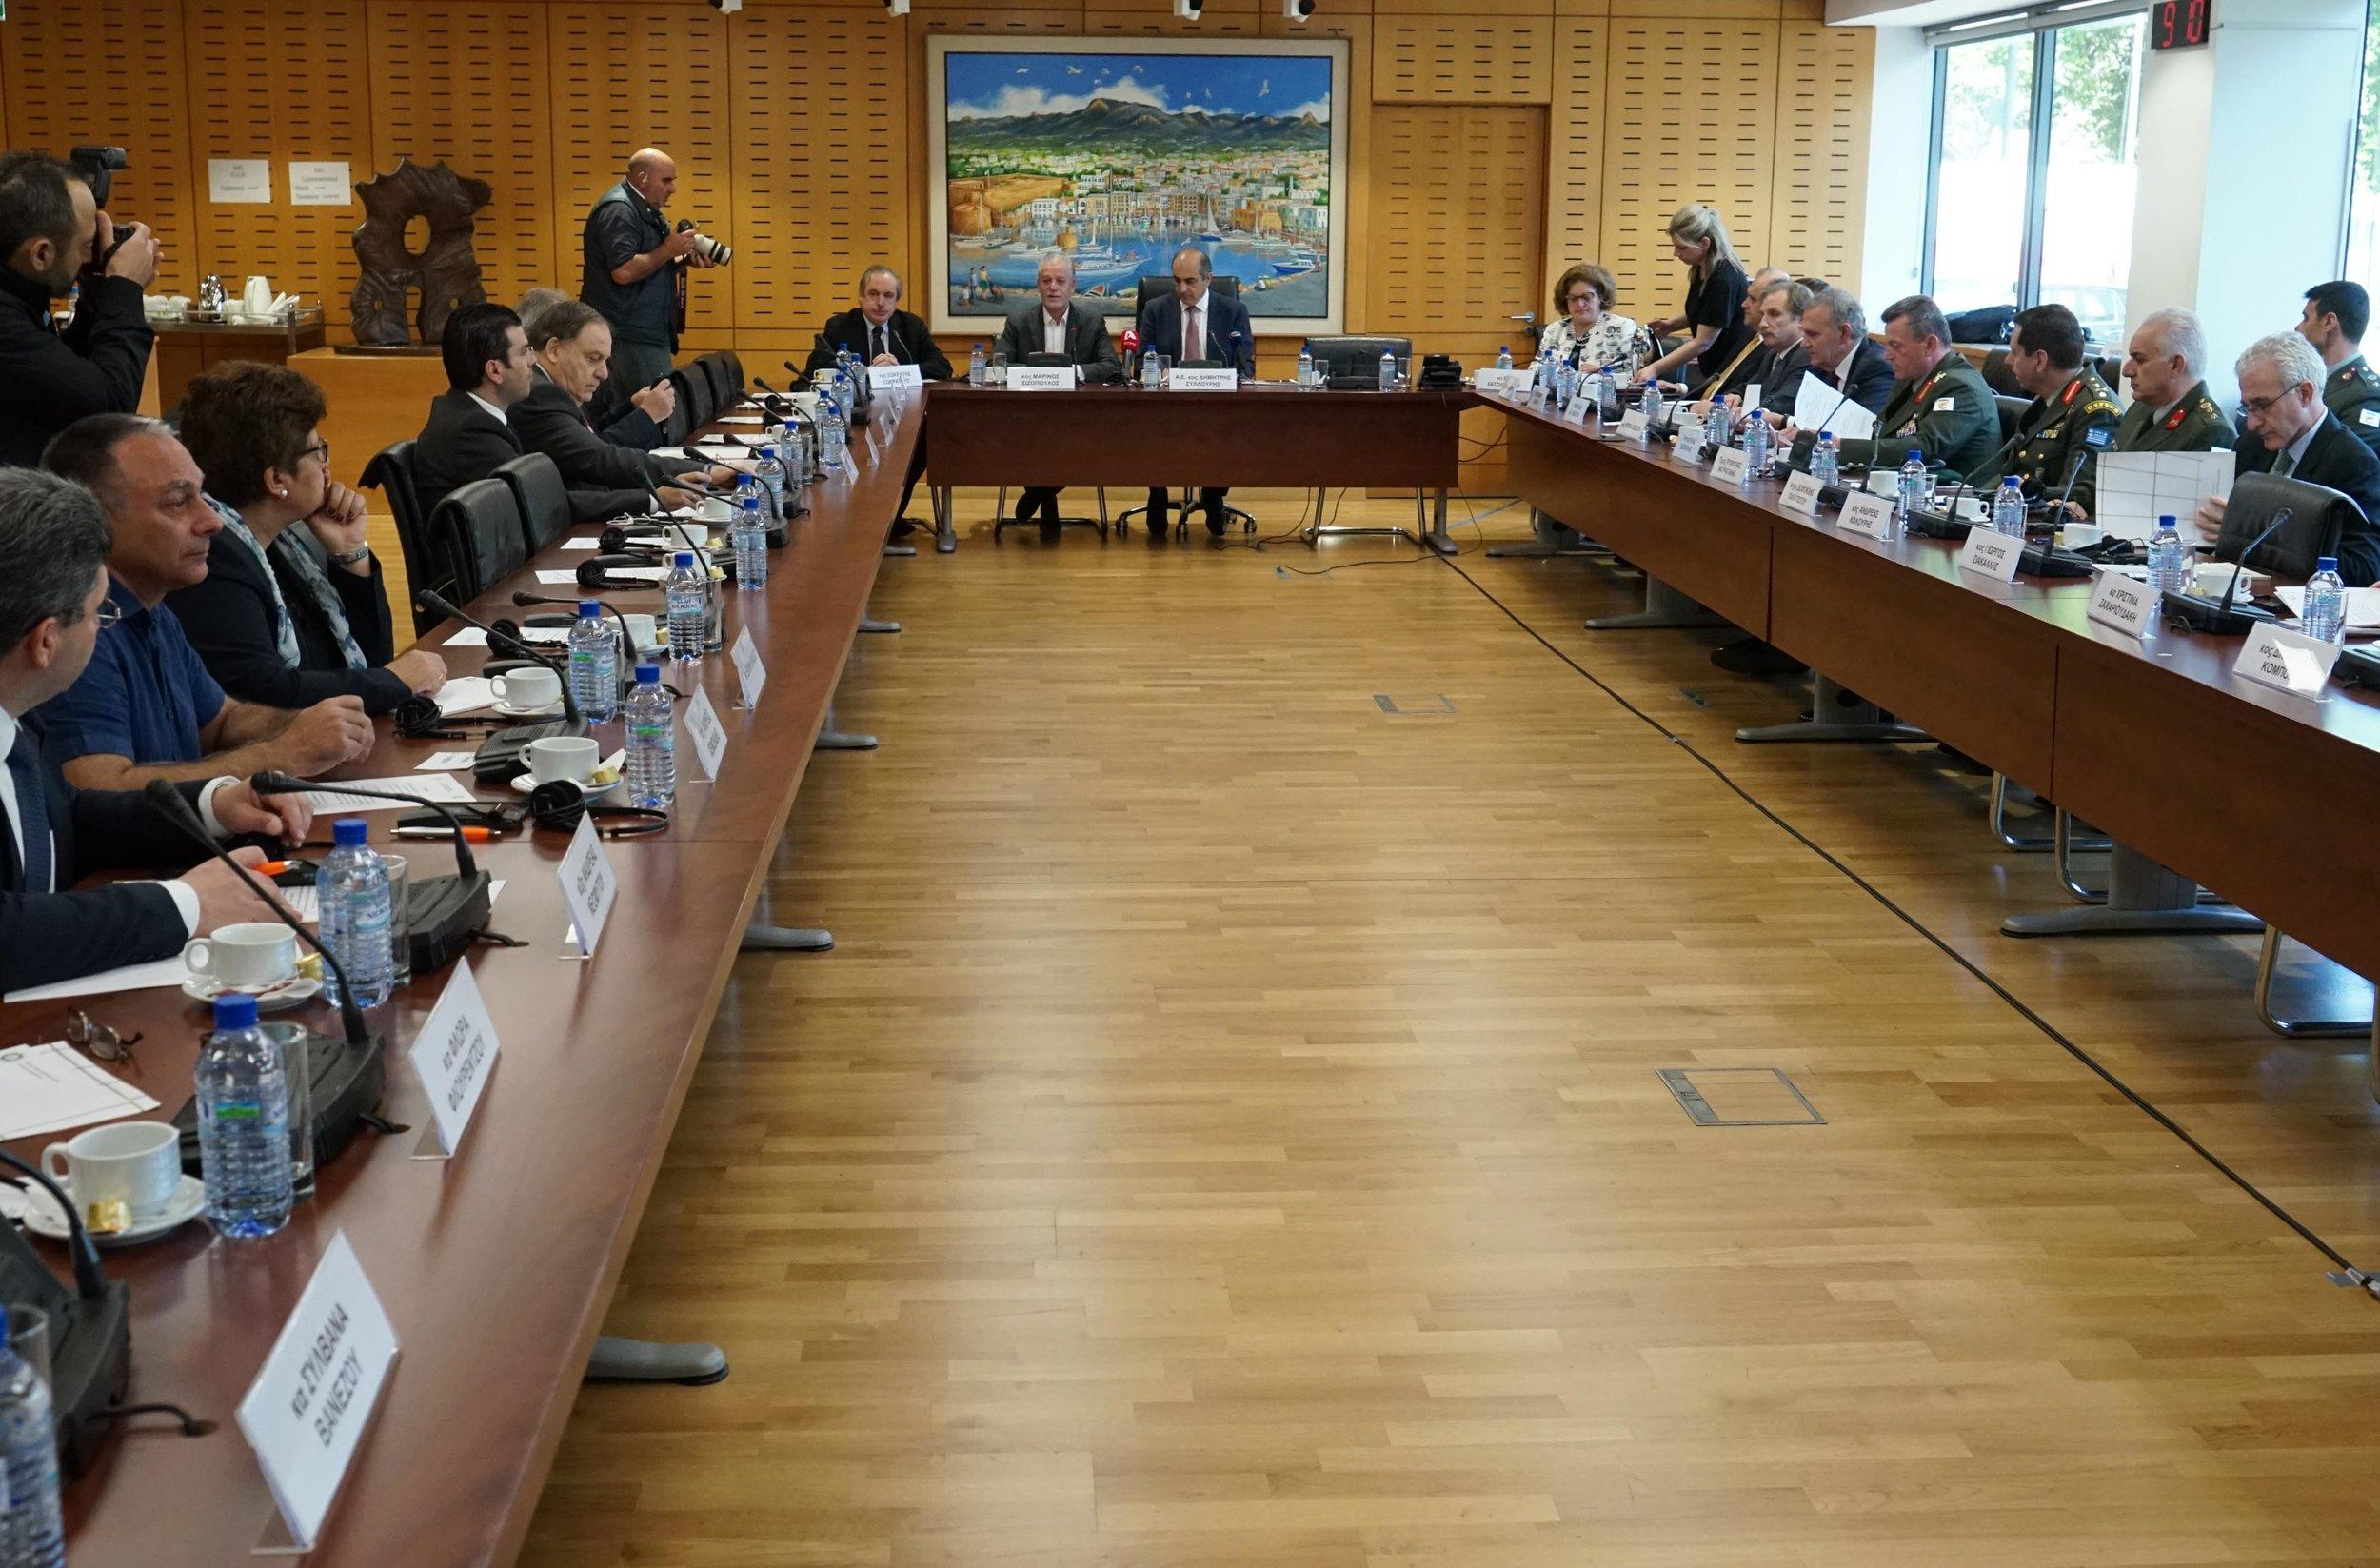 Cypriot House of Representatives President, Demetris Syllouris, hosts AHI for a closed session presentation.